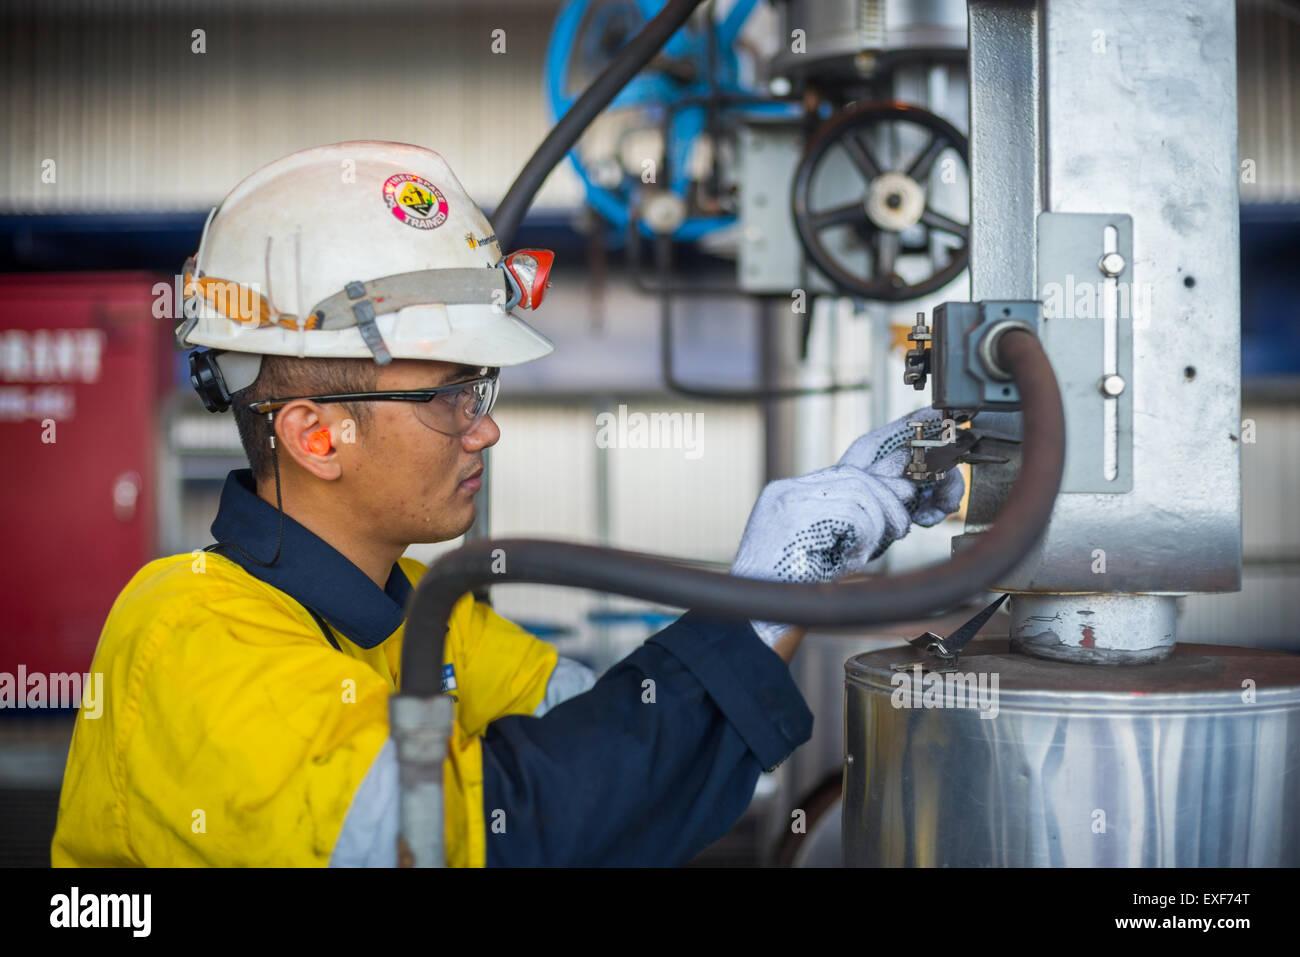 Technician doing maintenance work at coal-fired power plant